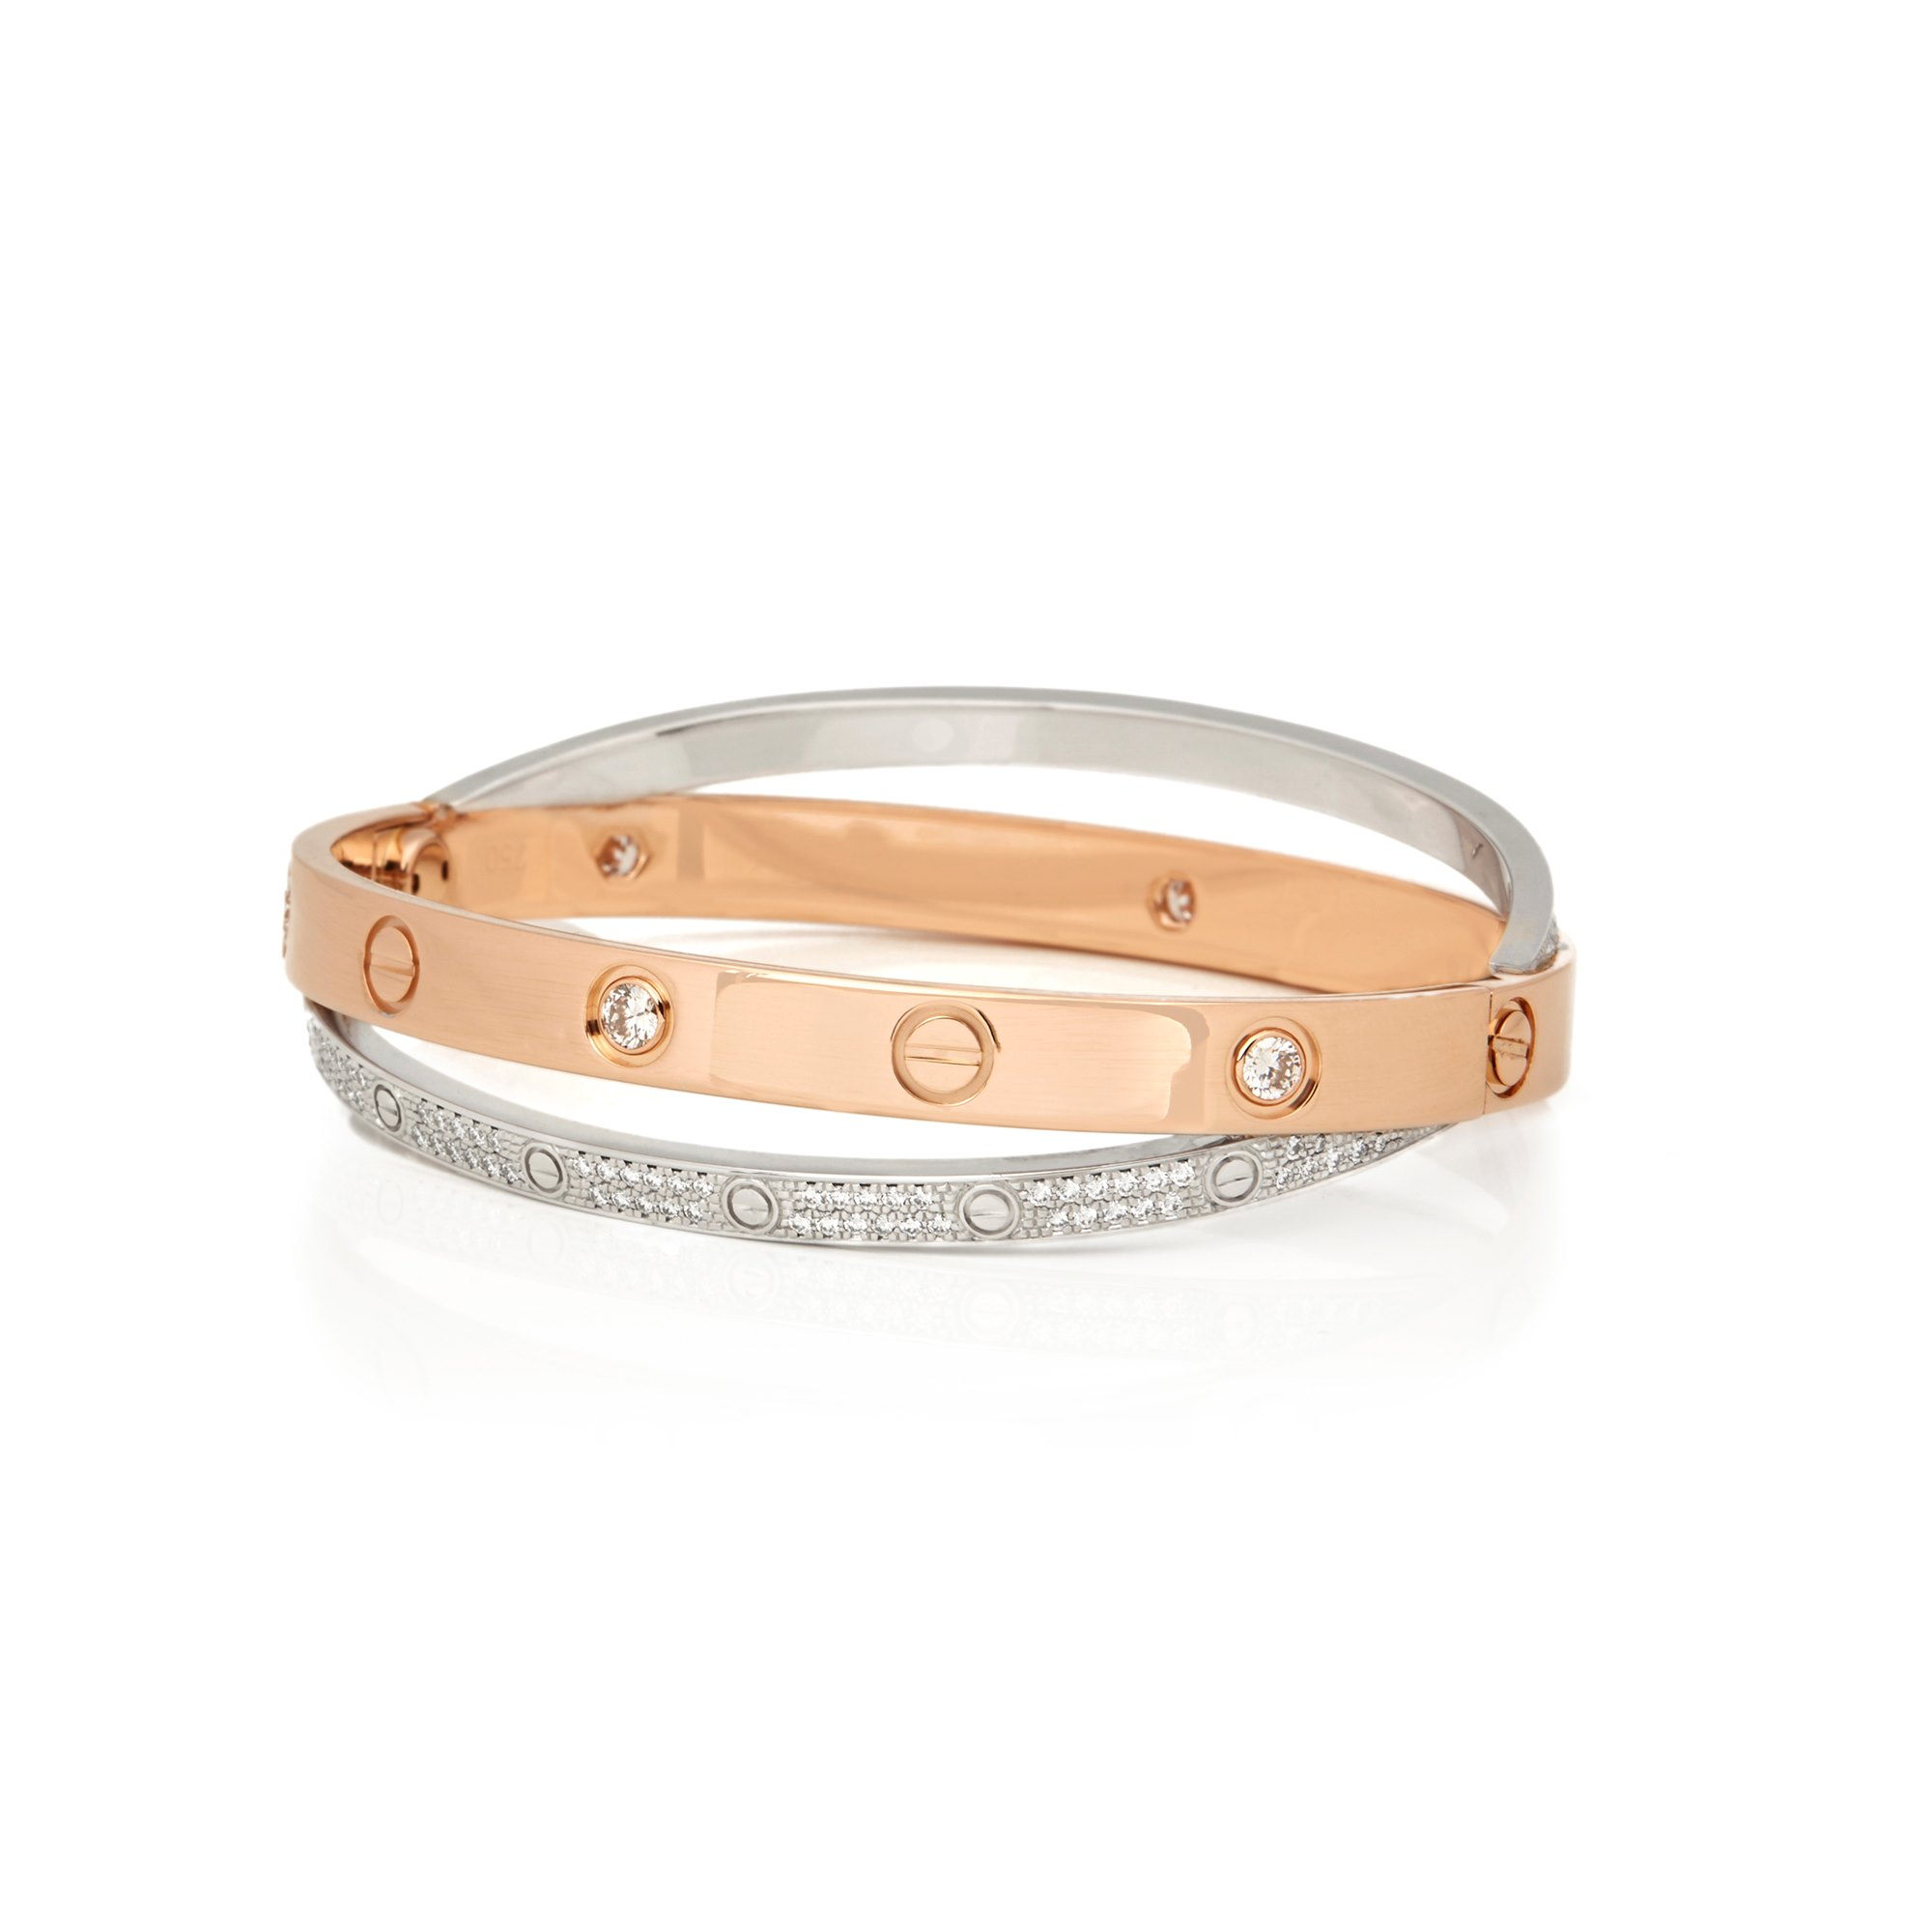 d2e3564c4 Cartier 18k Rose & White Gold Pavé Diamond Love Bracelet COM2072 ...